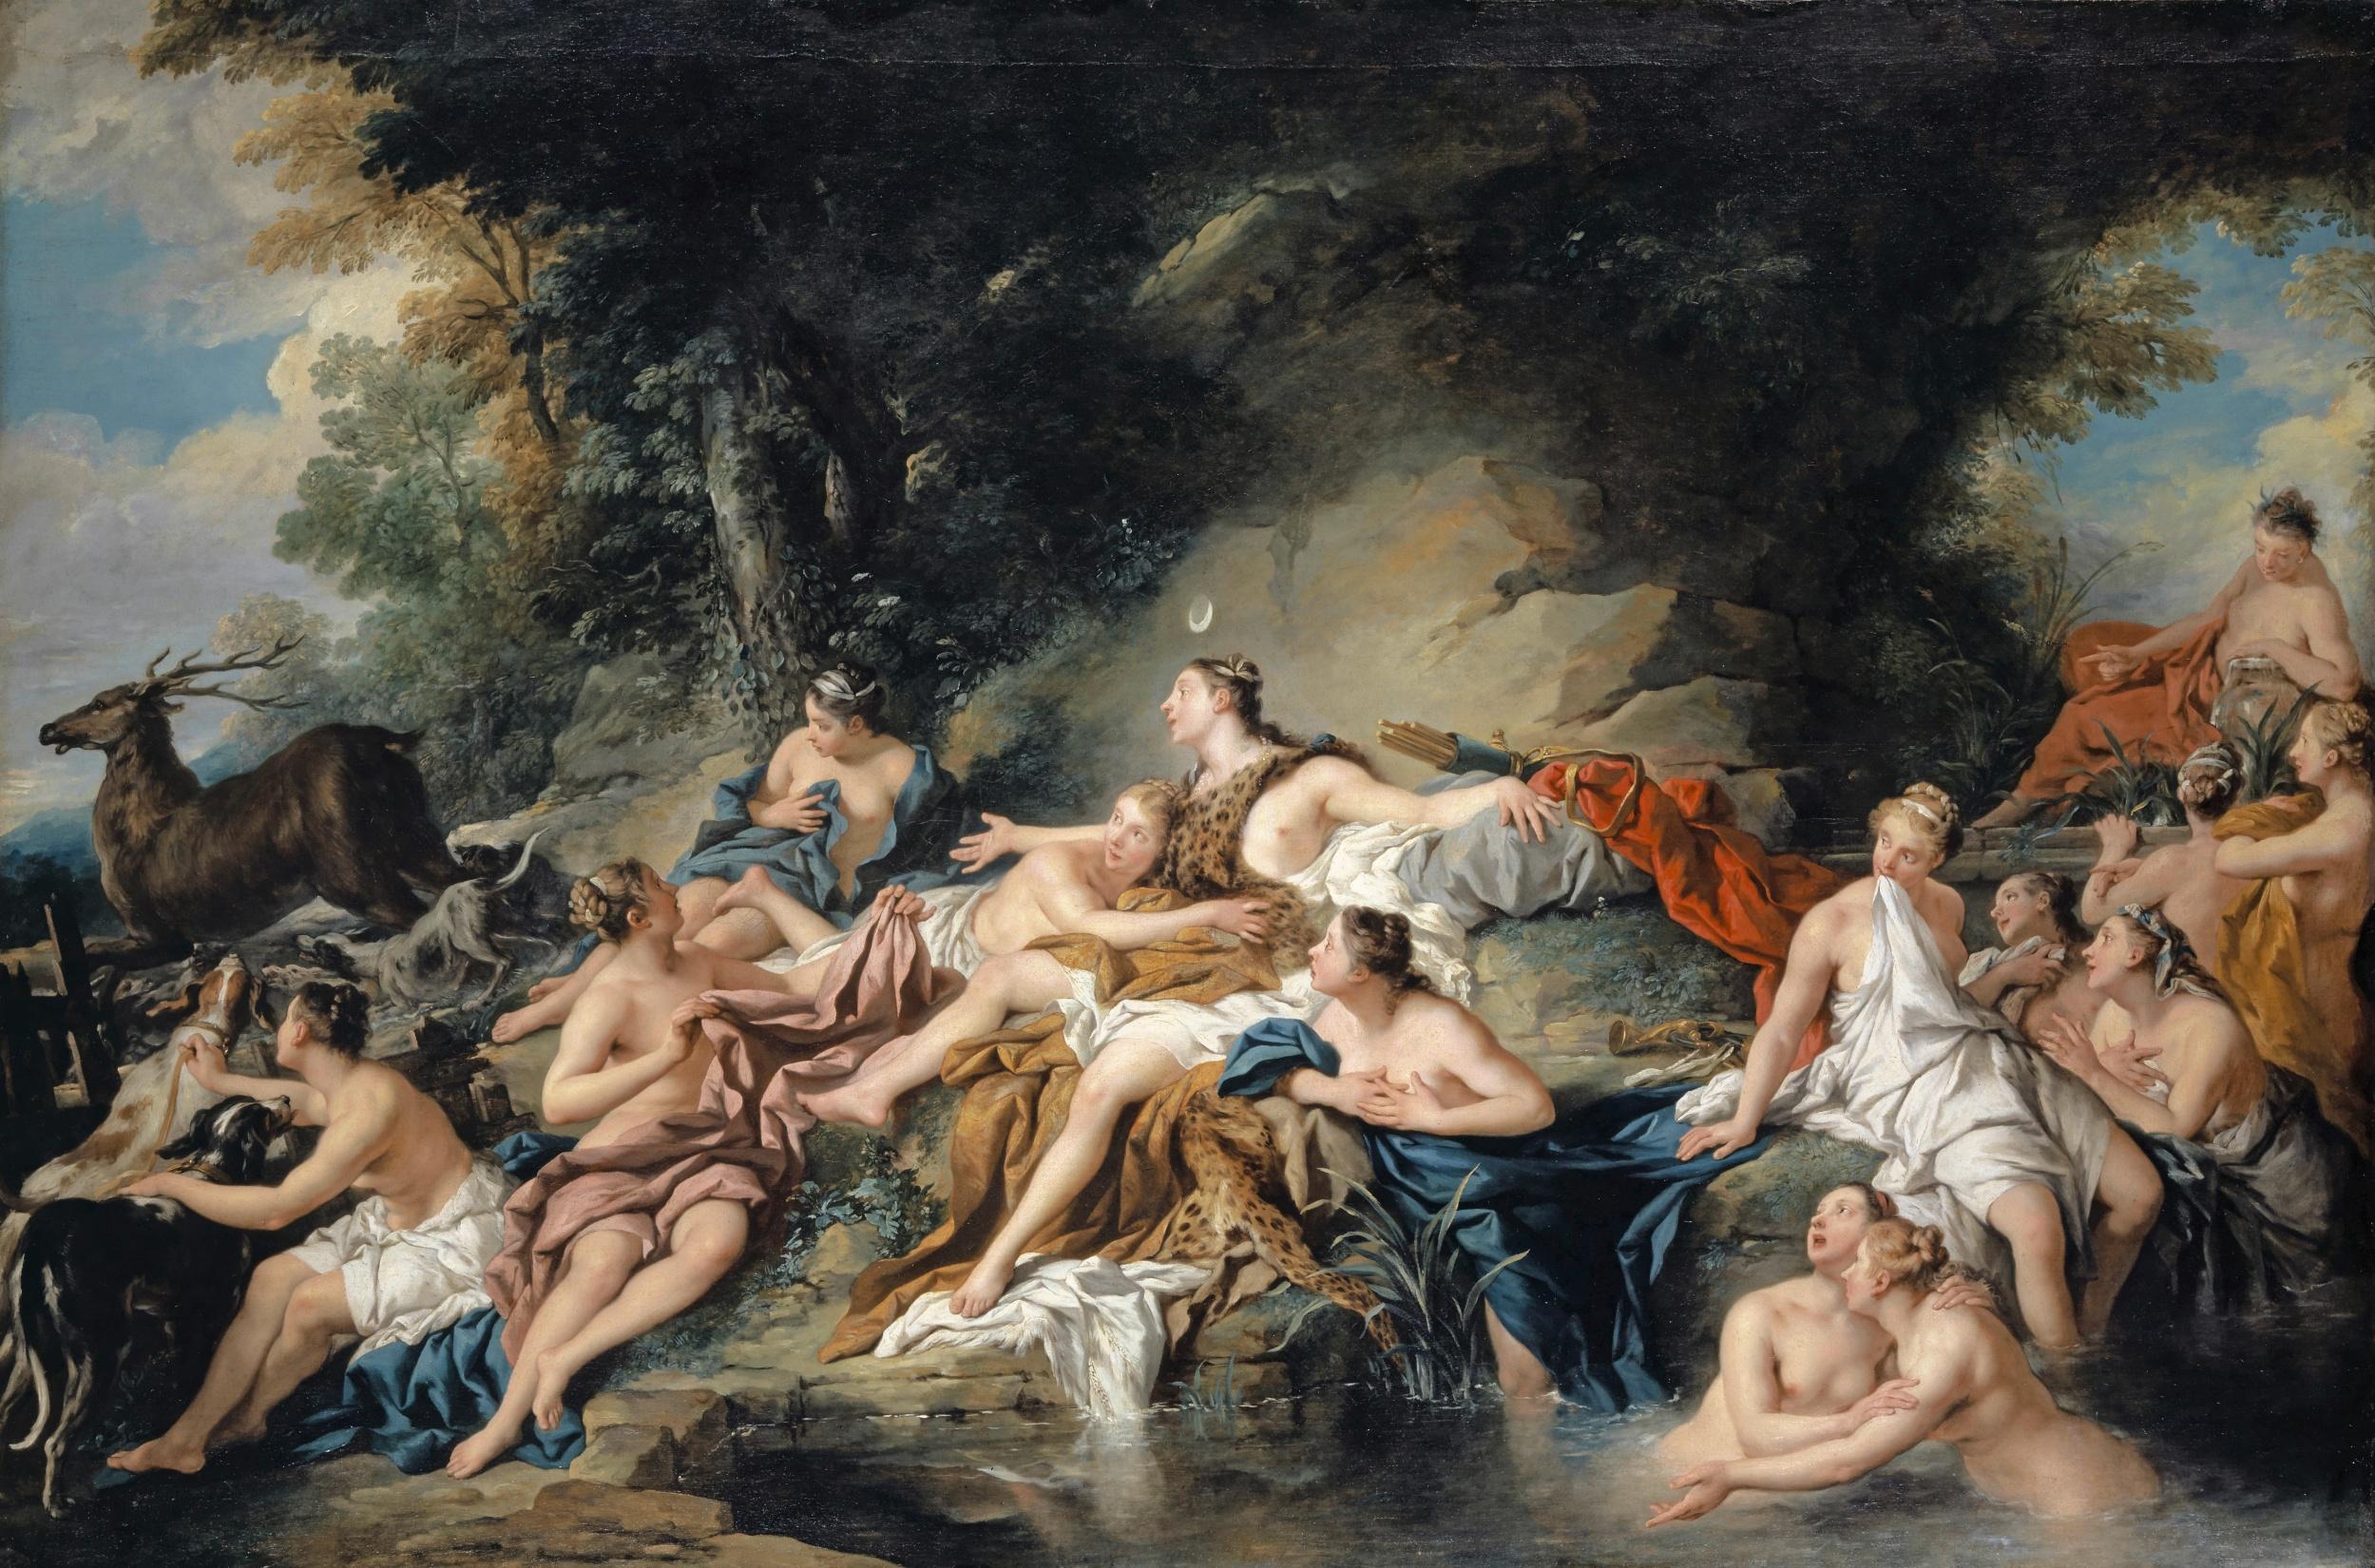 Jean-François de Troy, Diana und Aktäon, 1734. Kunstmuseum Basel